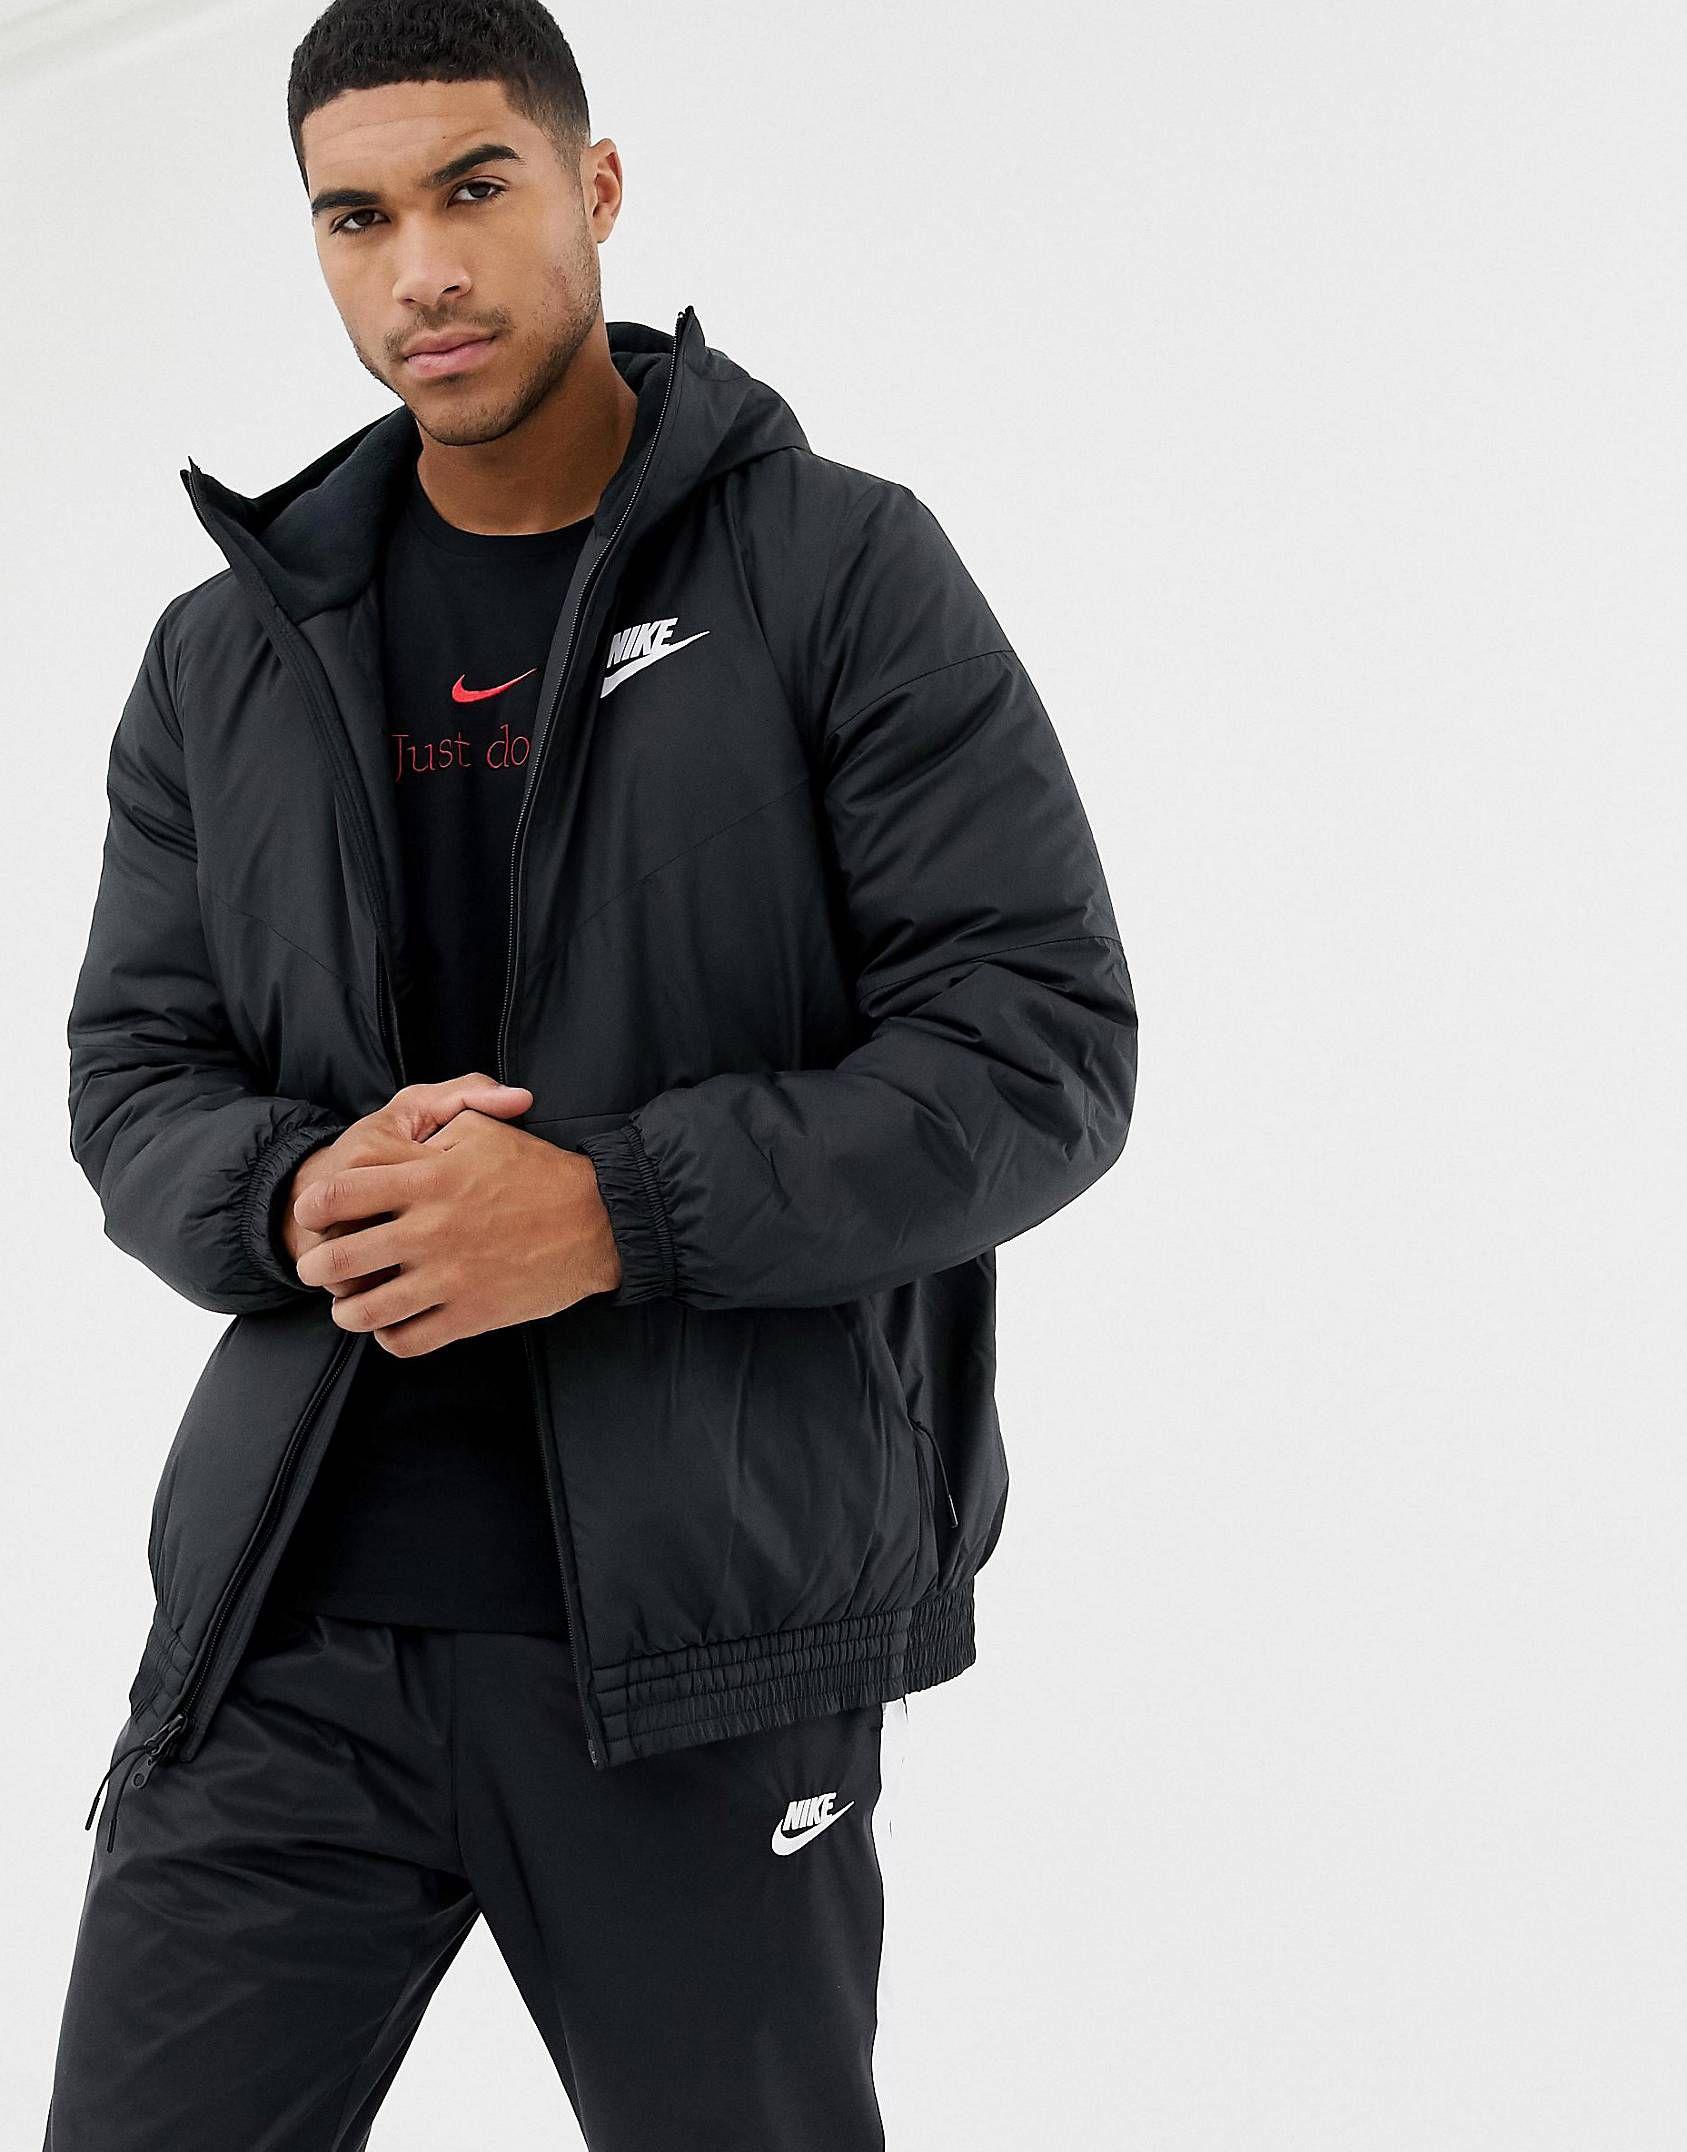 new list new products release date: Nike Windbreaker In Black 928861-010 | Black Friday | Nike ...